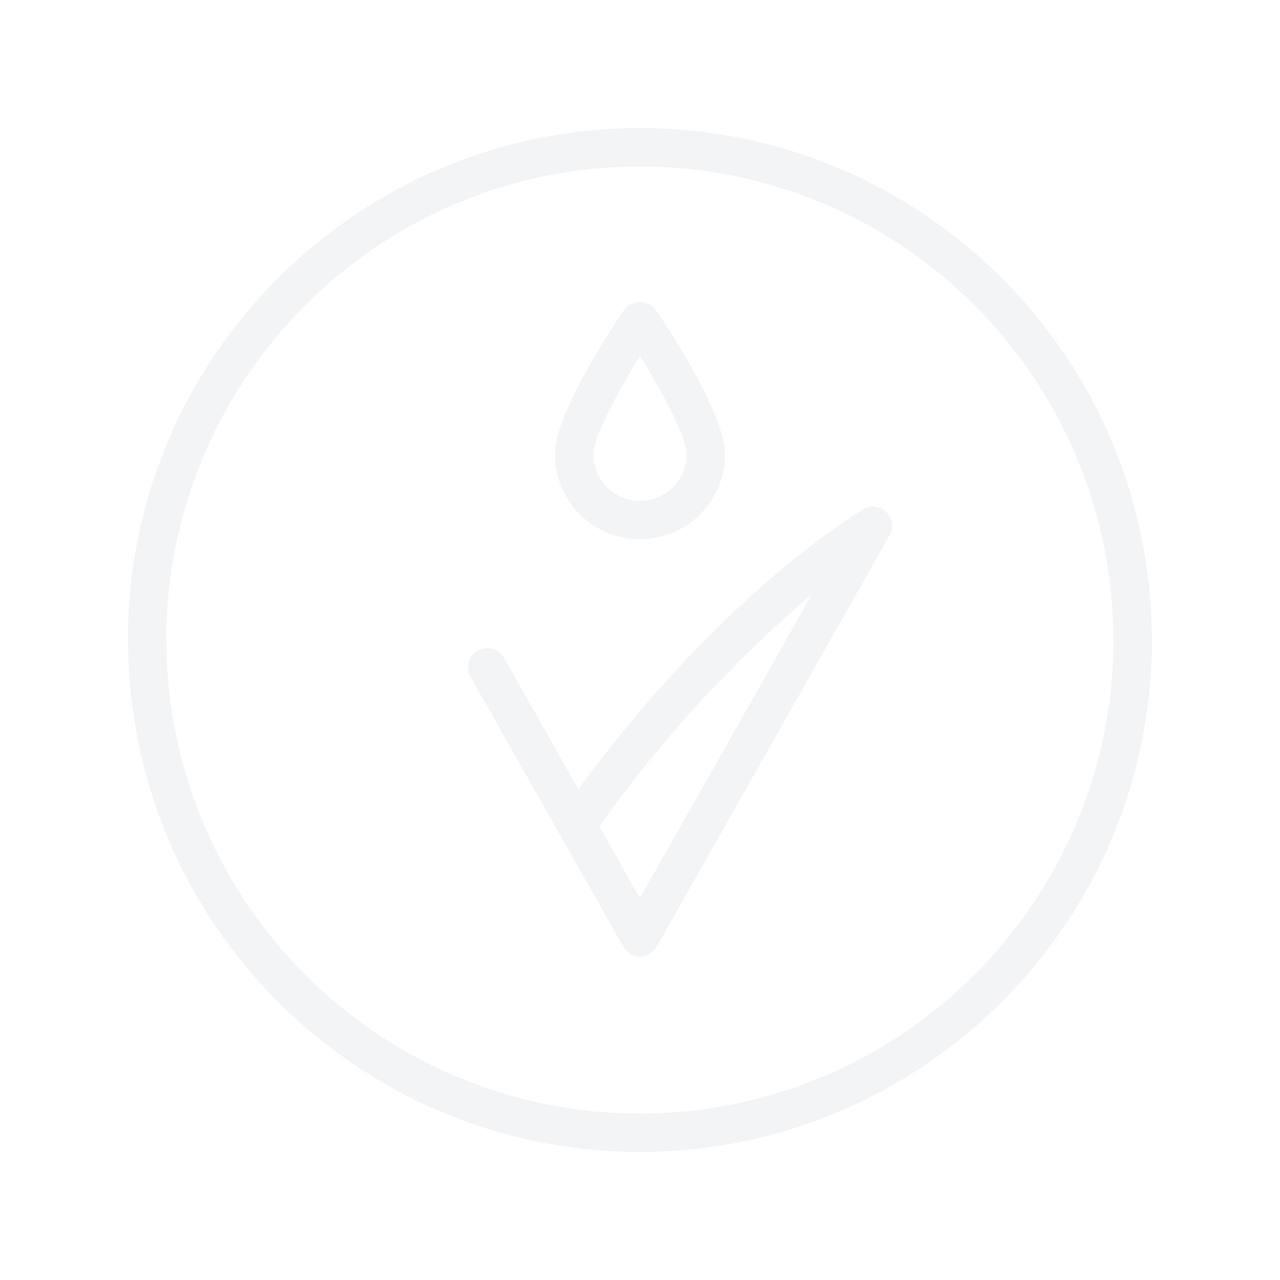 SAMPURE MINERALS Kabuki Brush кисть для нанесения косметики